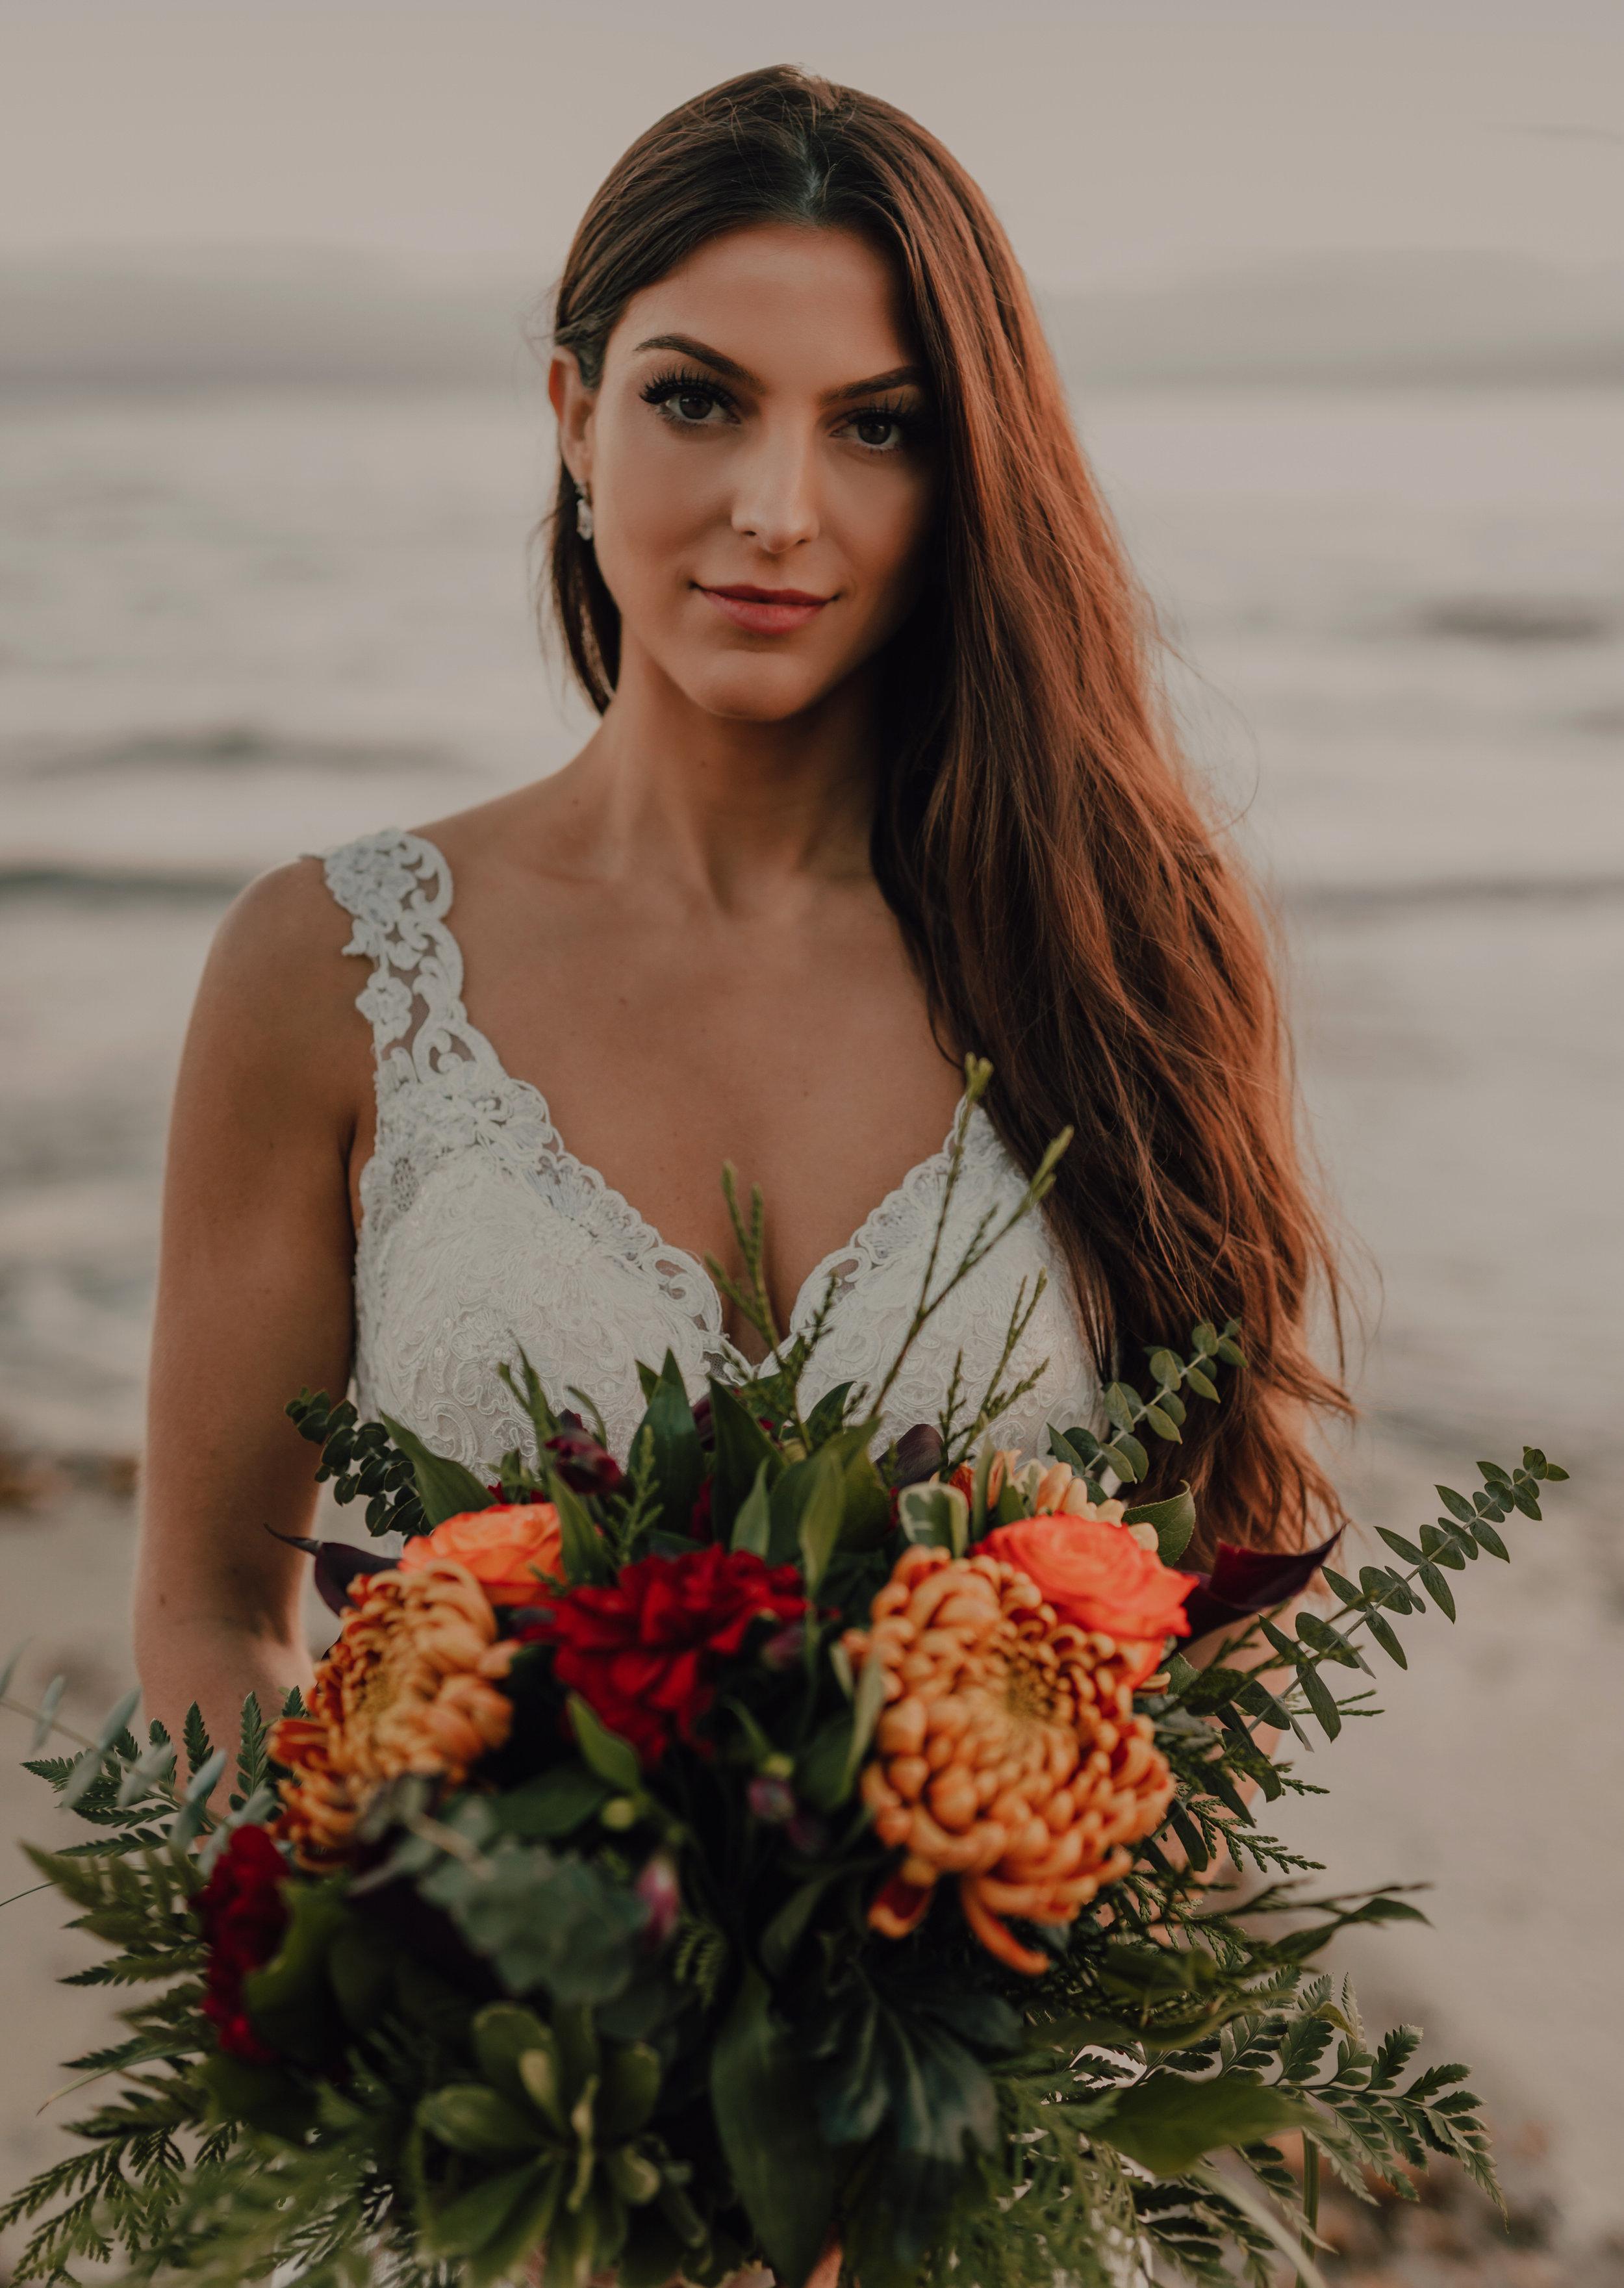 Day After Wedding Photos - Sunshine Coast Wedding Photos - Sunset Wedding Photos - Vancouver Wedding Photographer & Videographer - Sunshine Coast Wedding Photos - Sunshine Coast Wedding Photographer - Jennifer Picard Photography - 1A5A9489.jpg